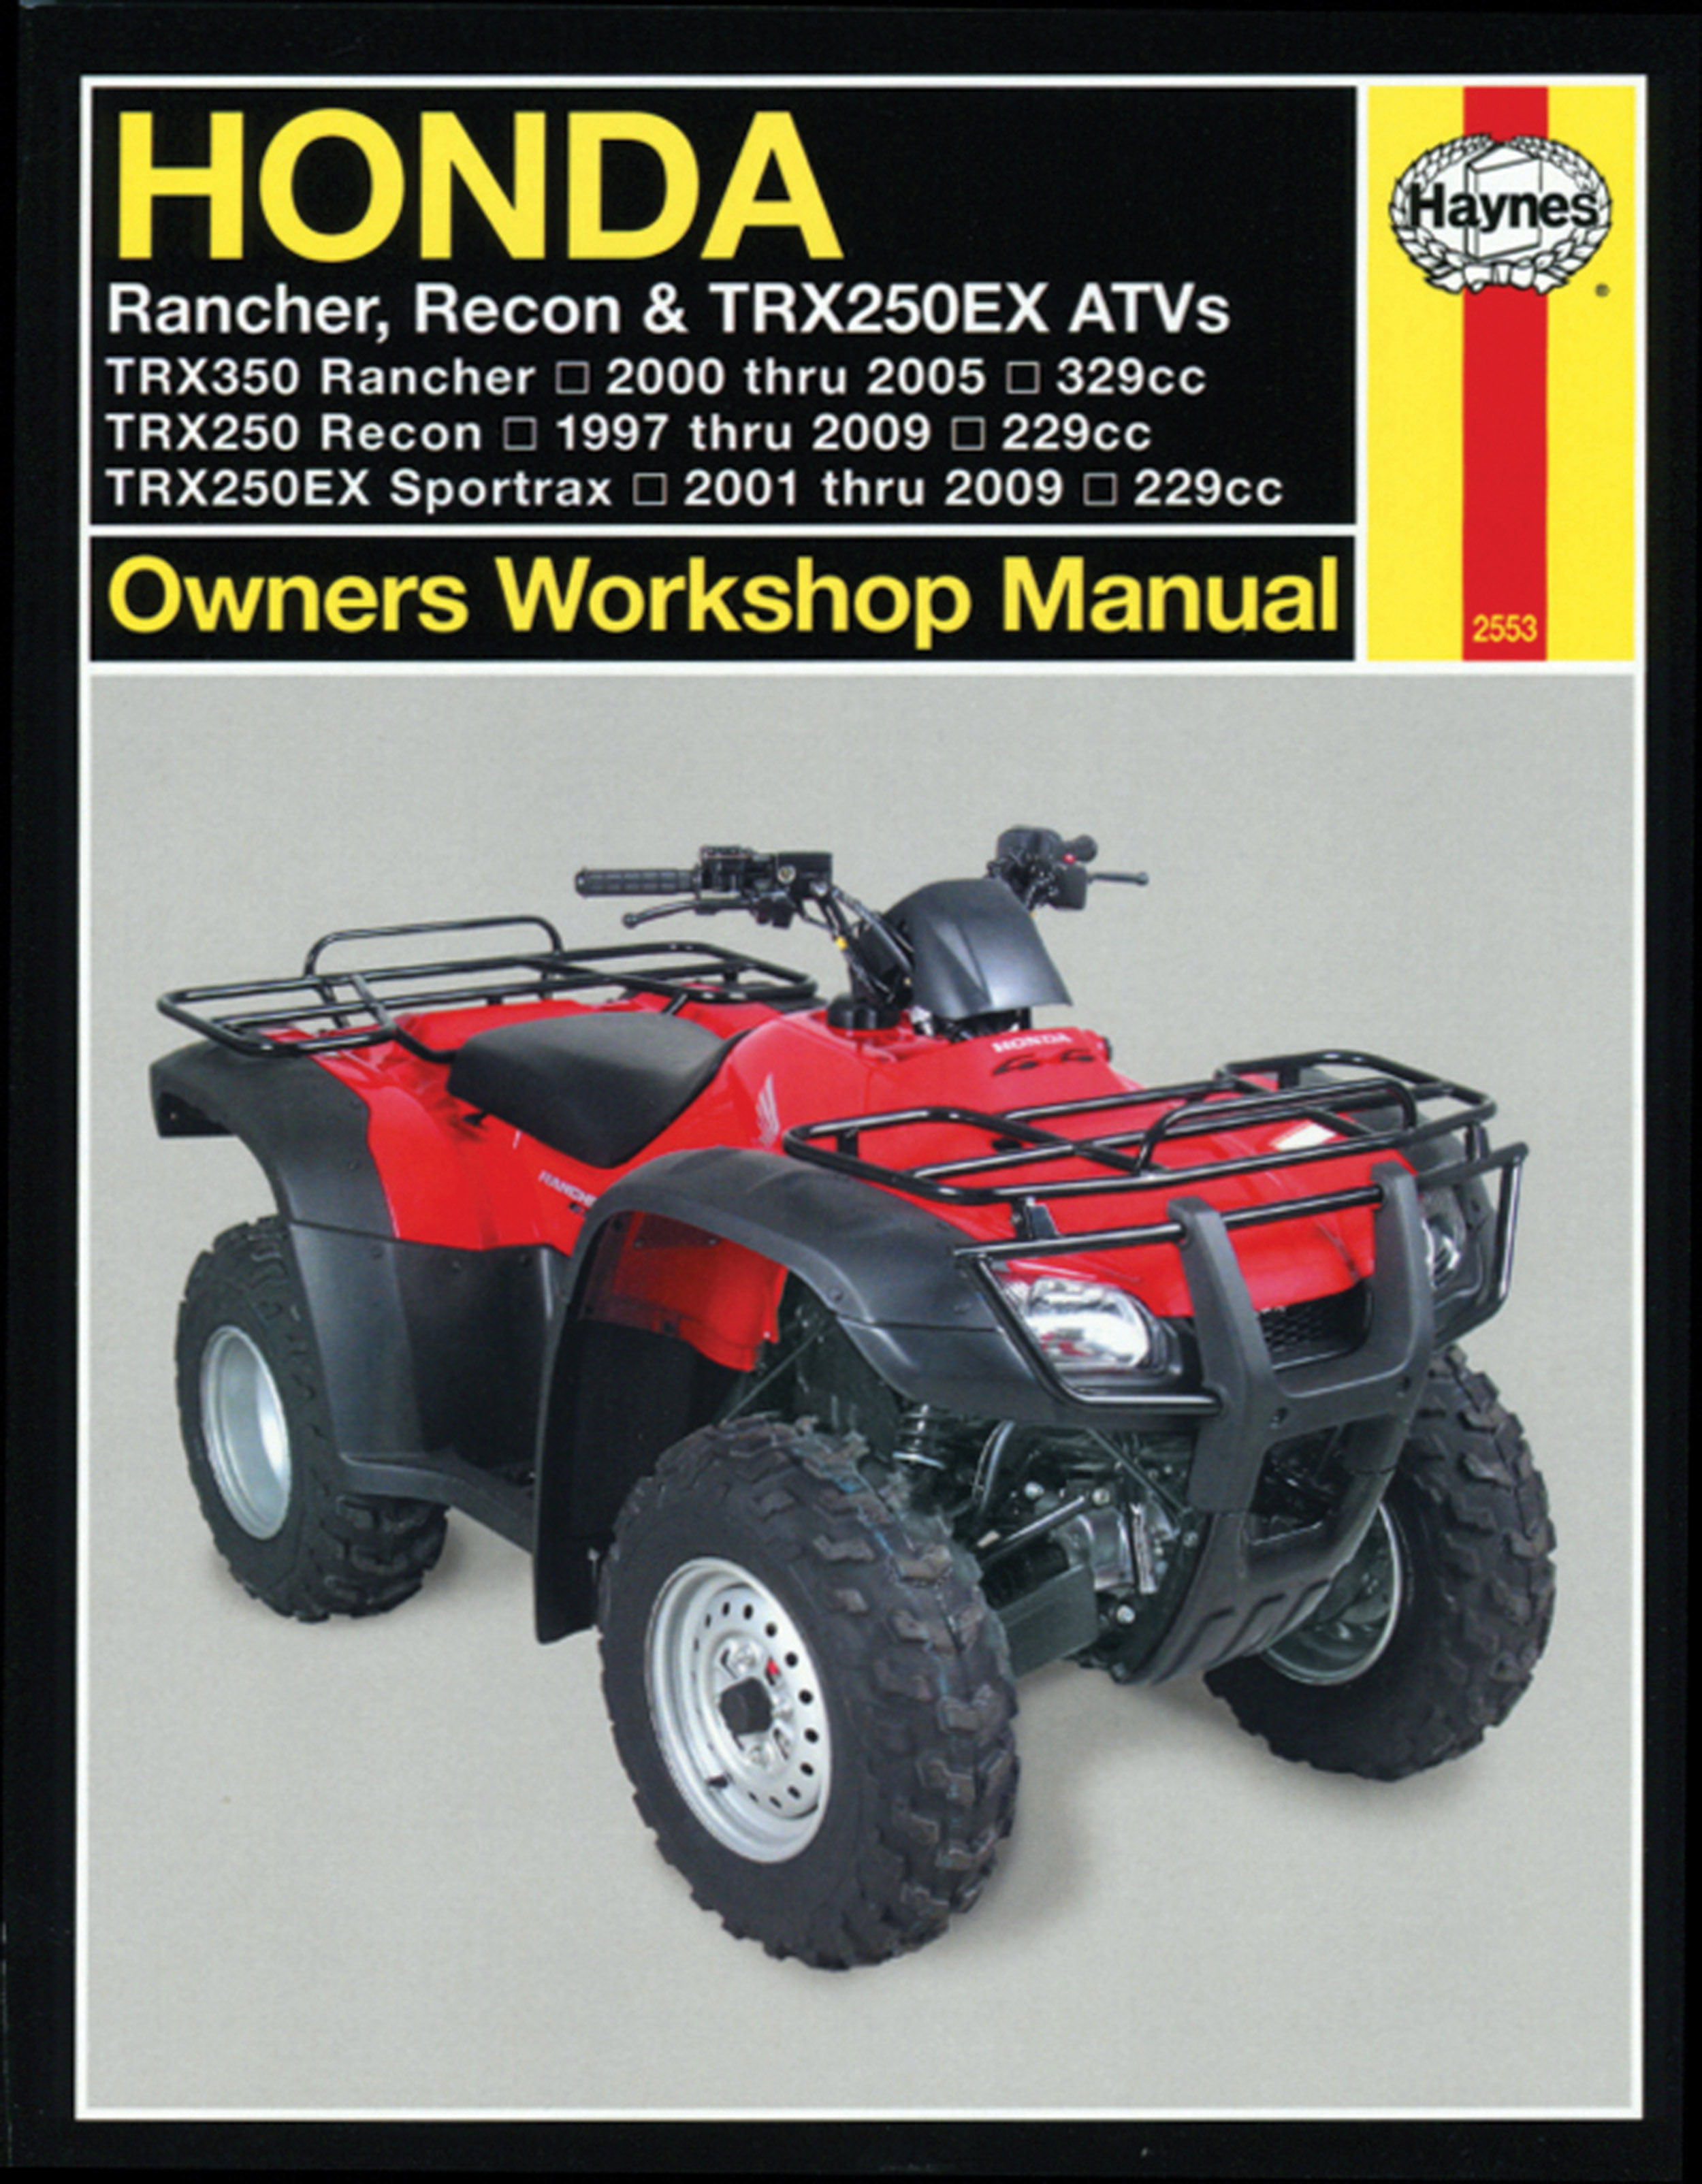 Honda 250ex Wiring Diagram About Haynes Repair Manual Trx250 Recon 1997 09 Trx250ex Trx400ex